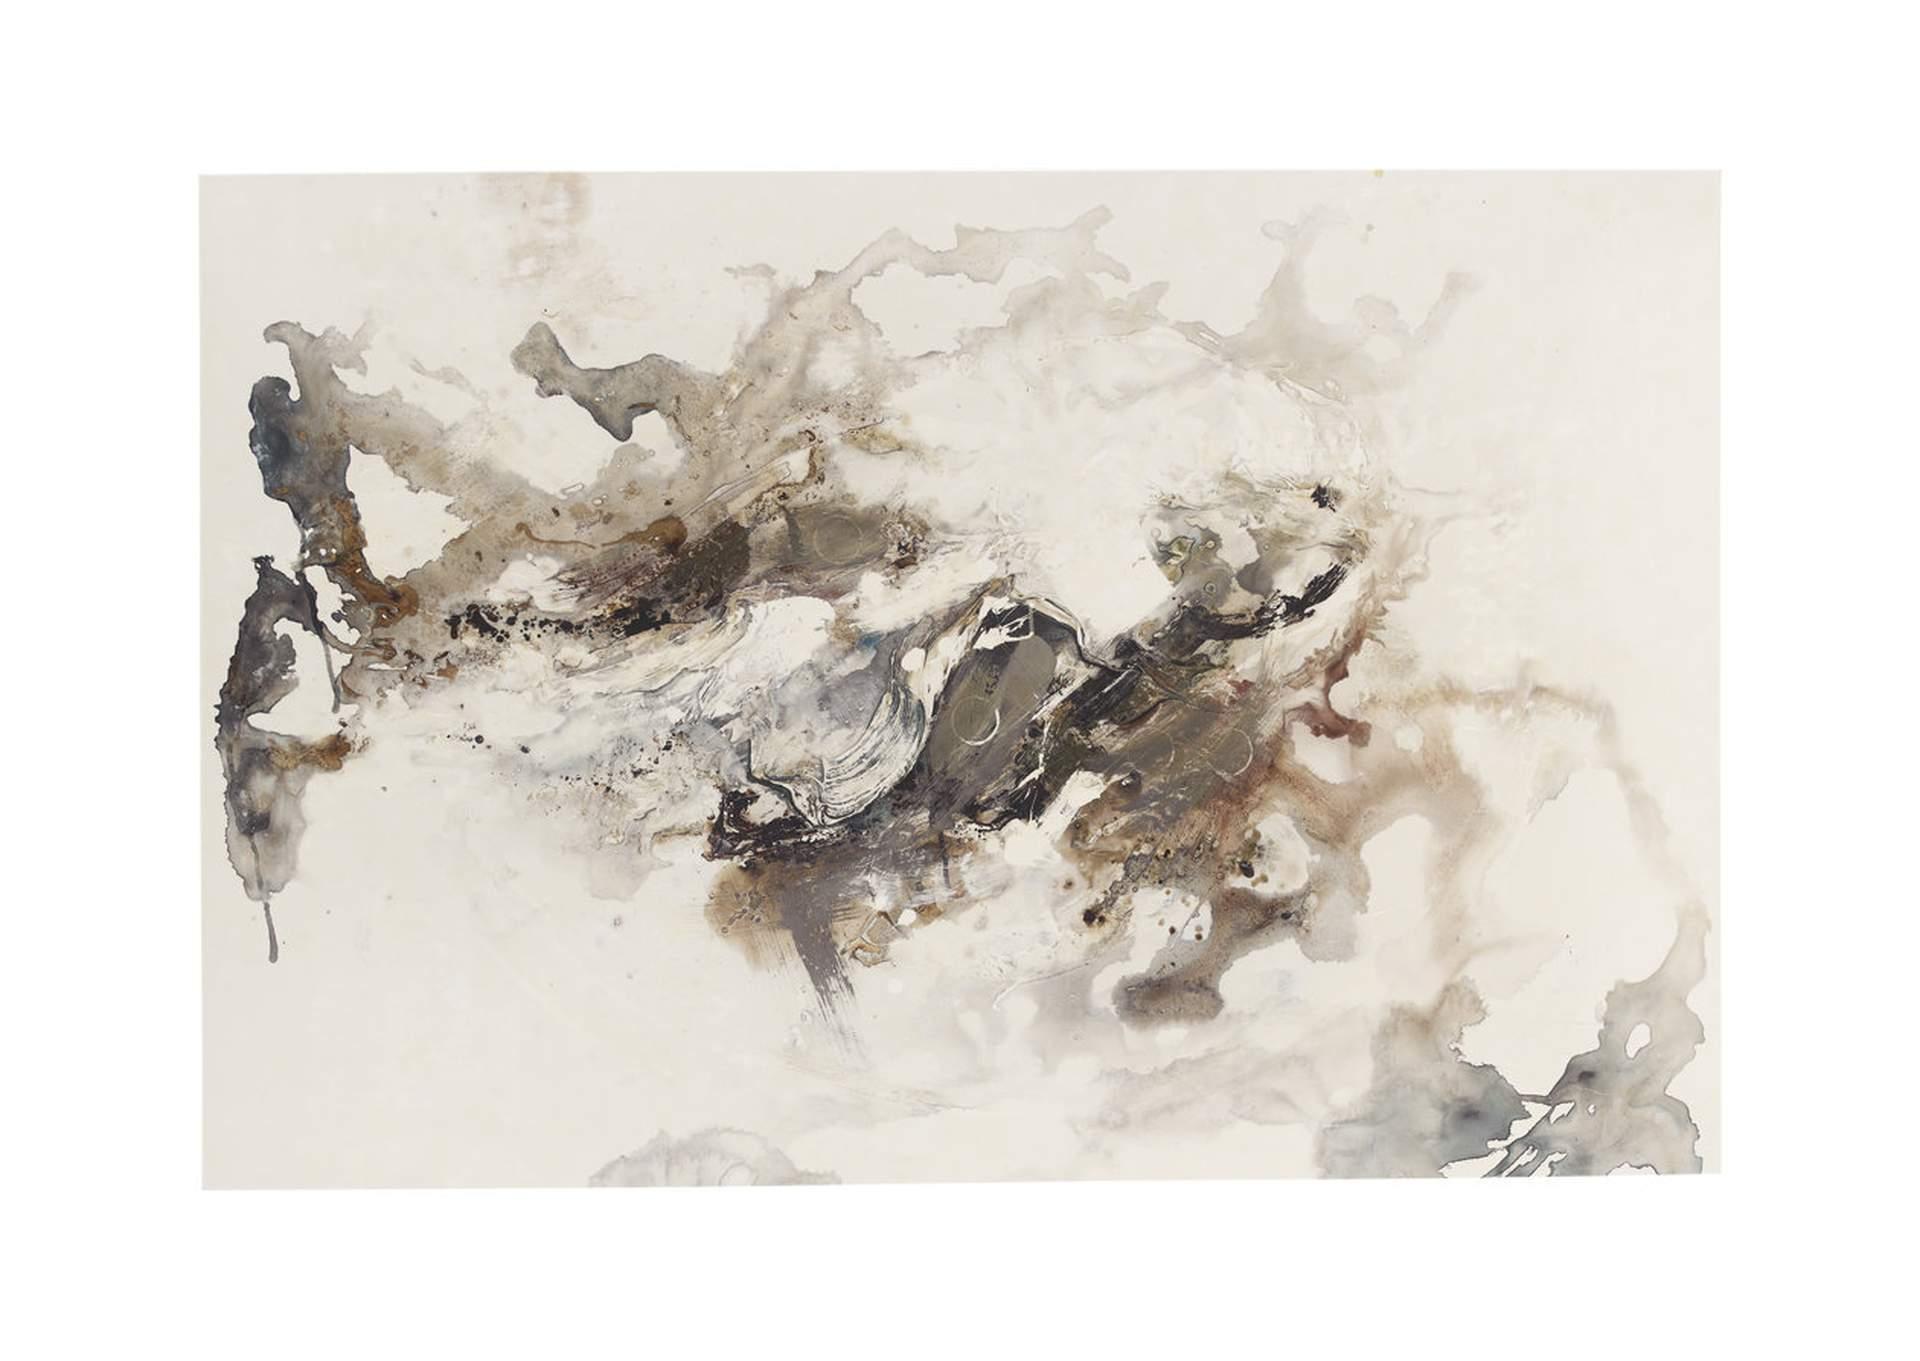 Arte mural Annora en color gris/marrón/blanco azul/negro   PEDIDO ESPECIAL